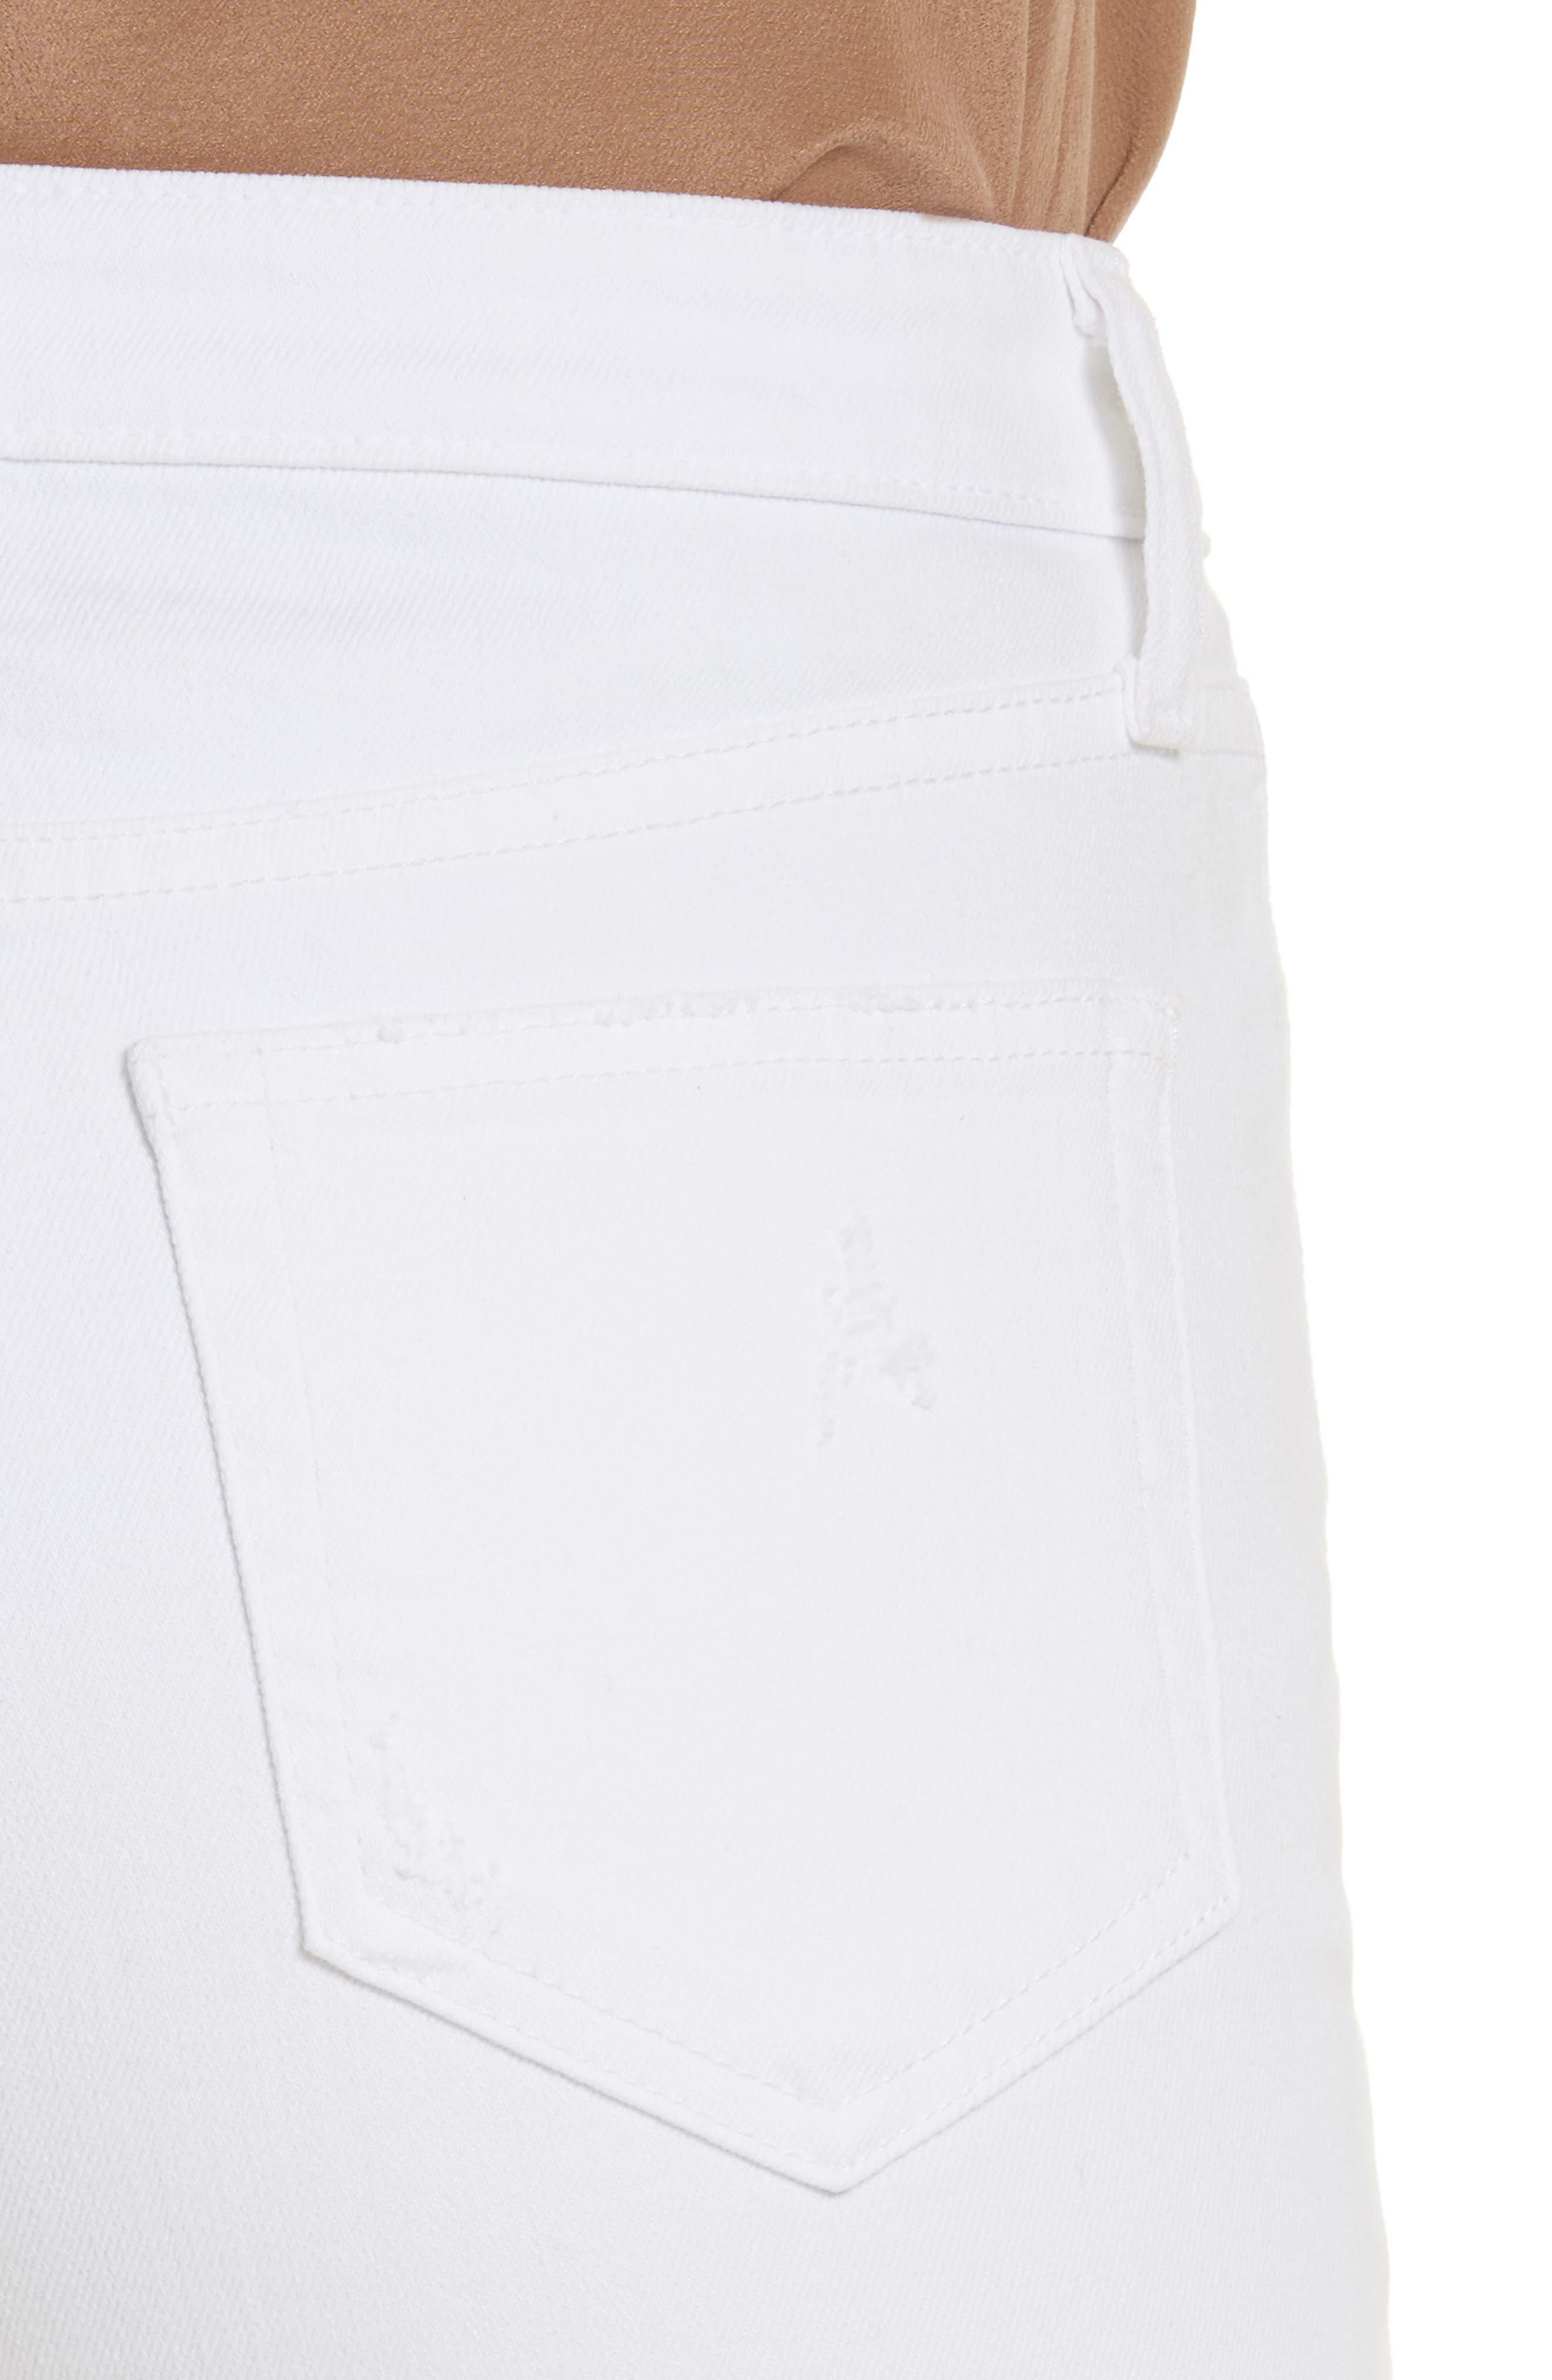 Audrina Ripped Straight Leg Crop Jeans,                             Alternate thumbnail 4, color,                             BLANC WORN DESTRUCT